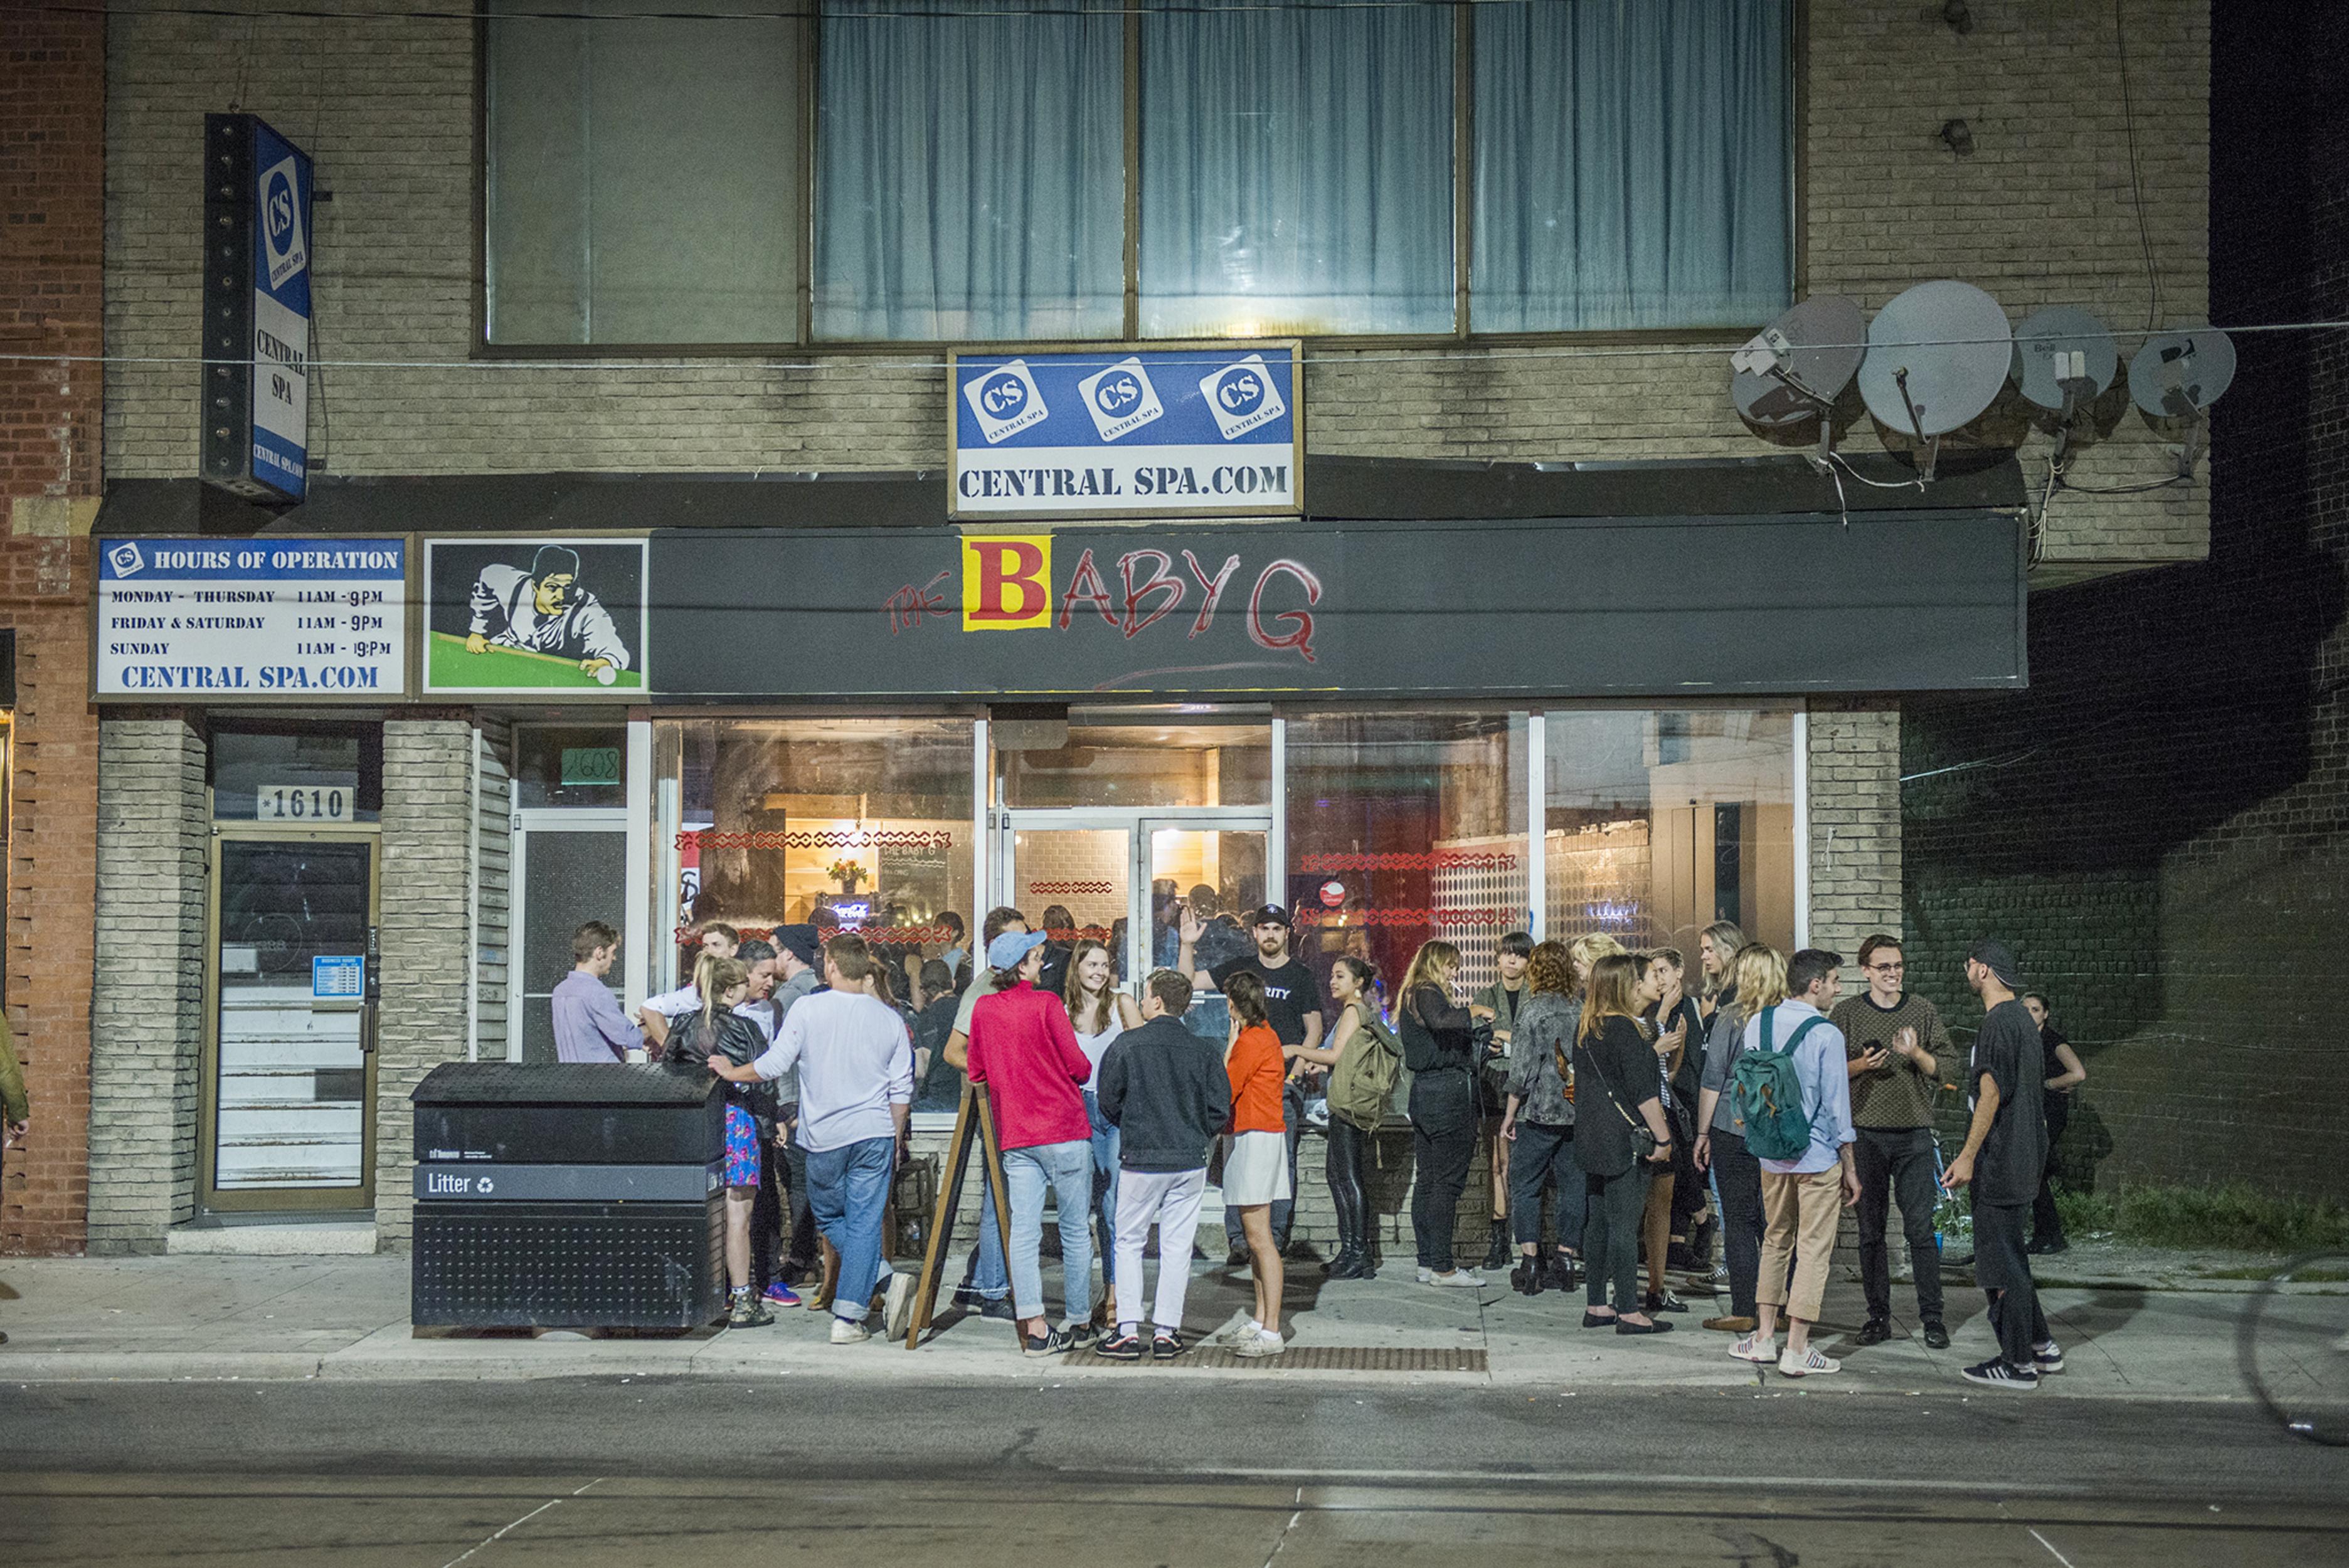 The Baby G Toronto